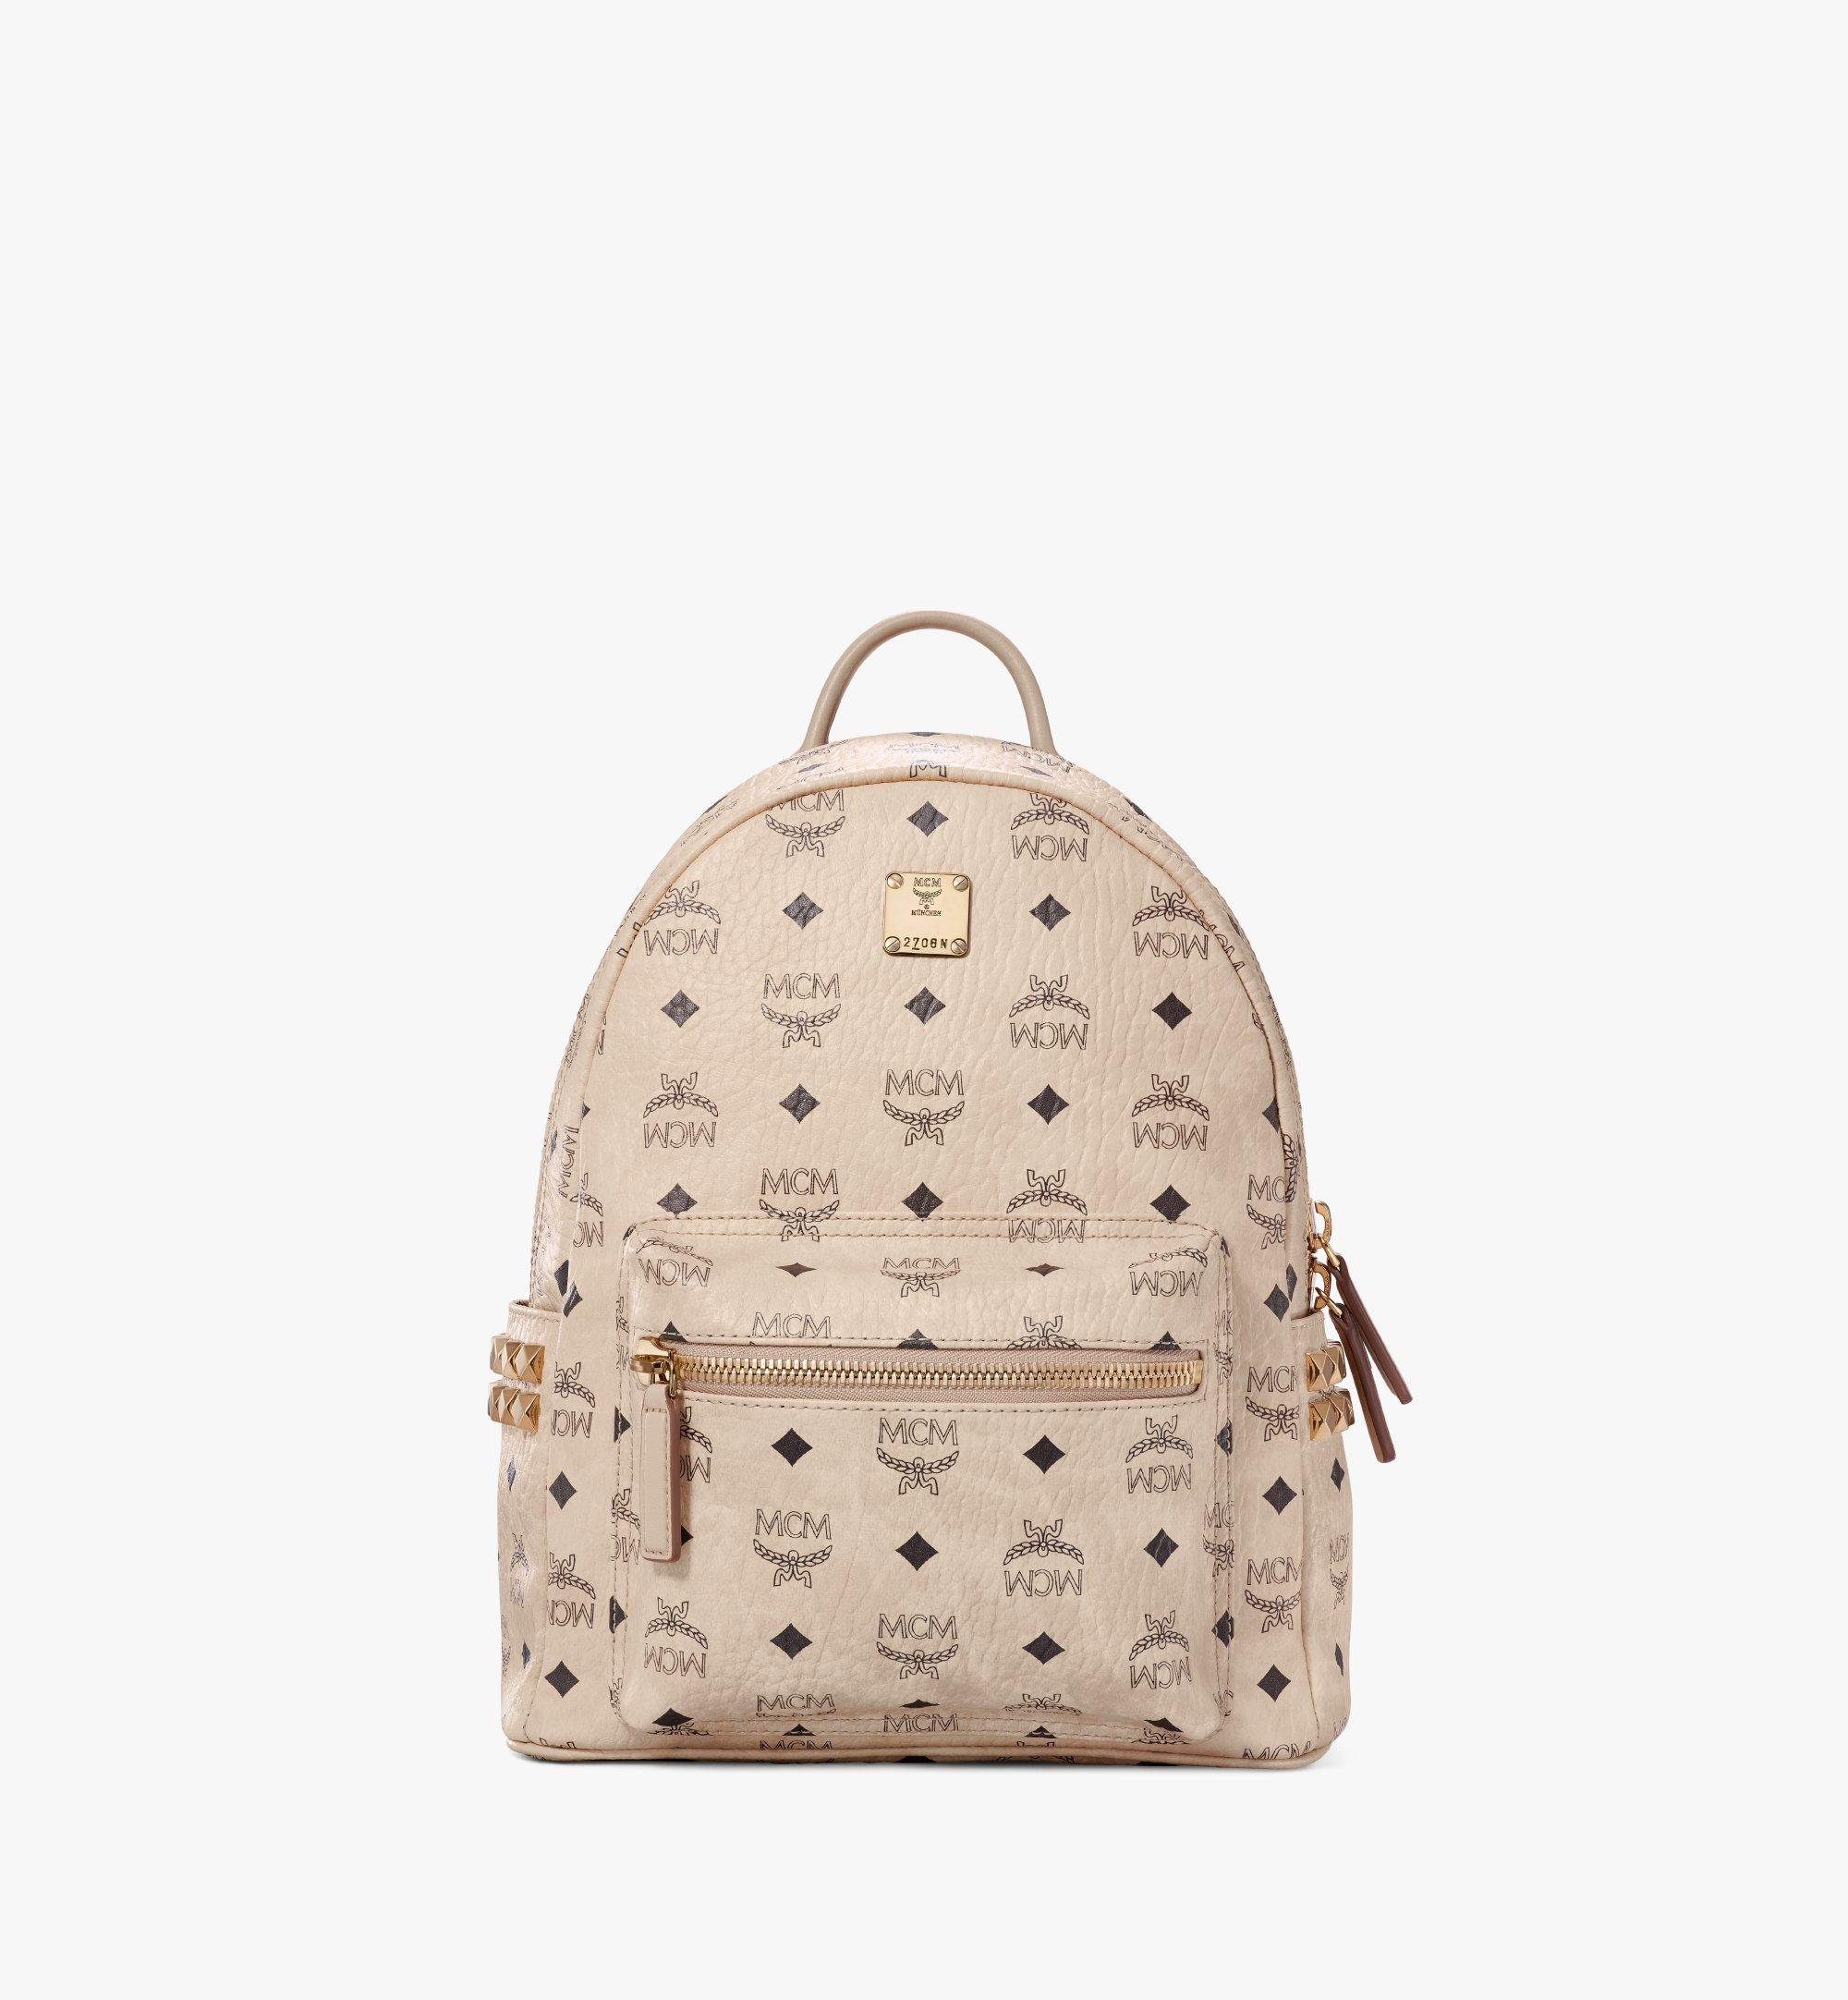 32 cm 12.5 in Stark Side Studs Backpack in Visetos Beige